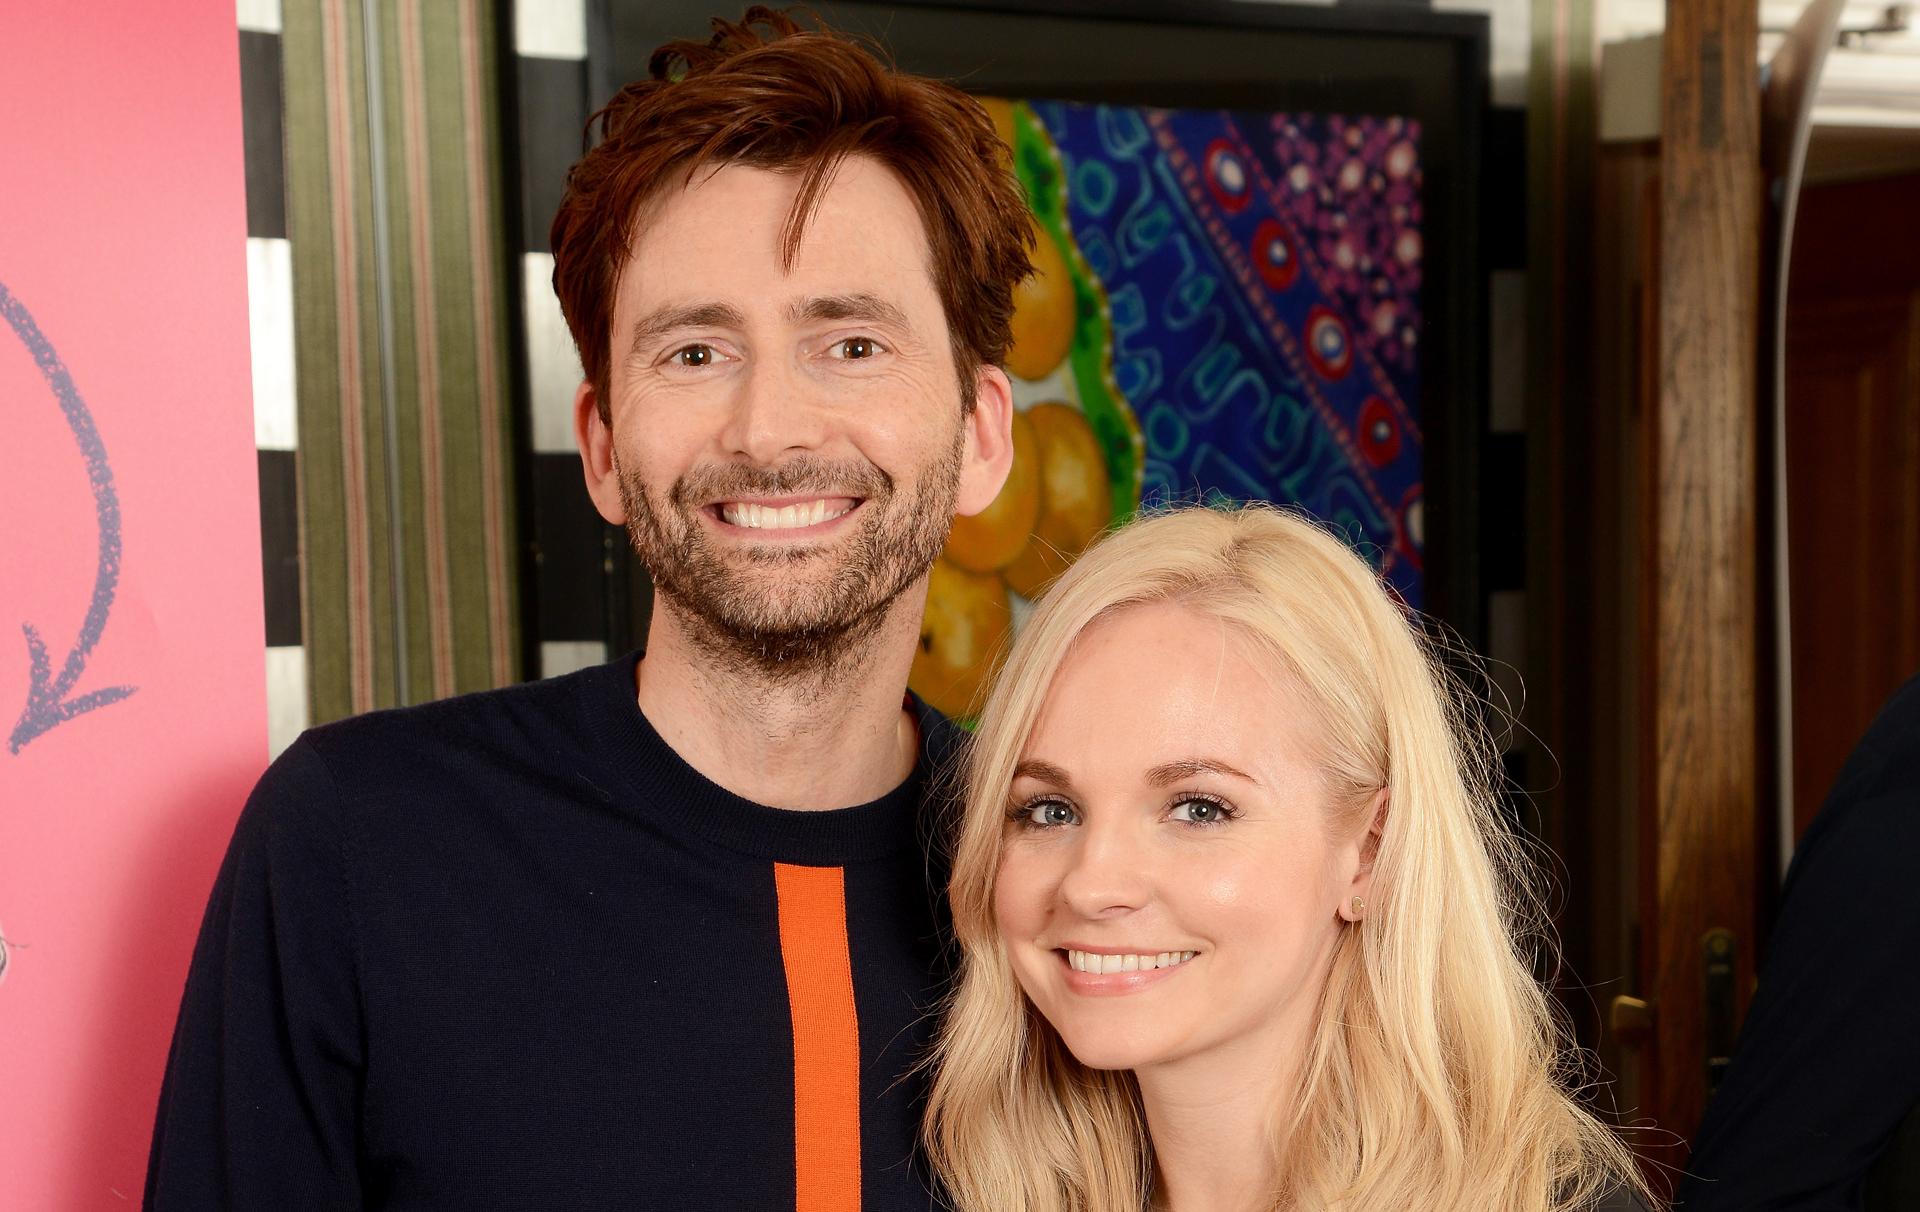 David and Georgia Tennant